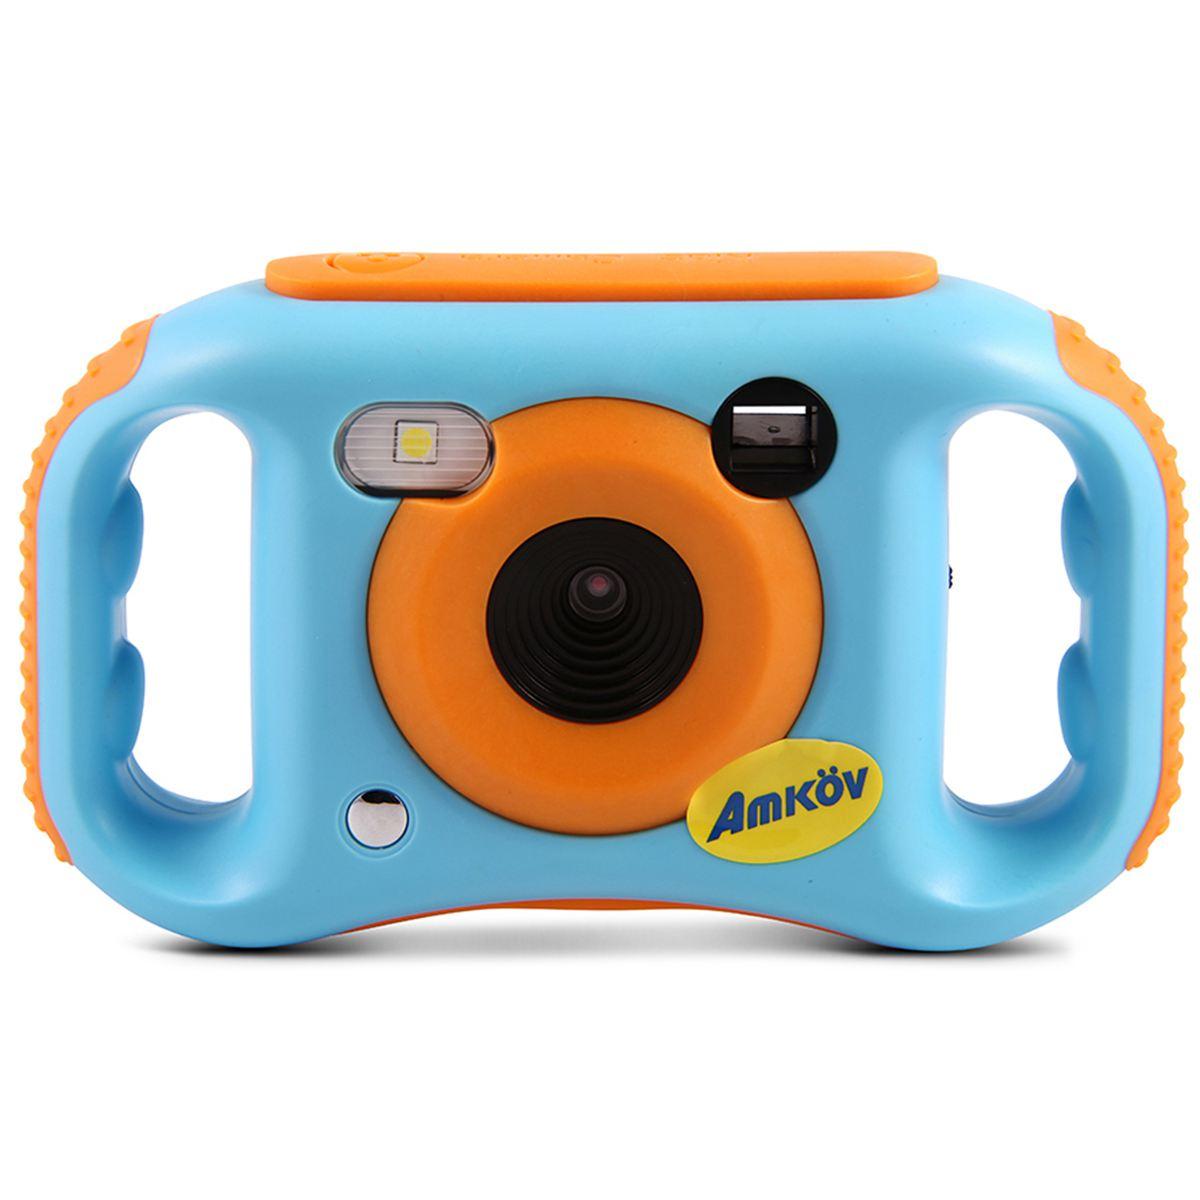 Amkov Kids Digital Video Camera WiFi Connection 5 Megapixels Gift For Children Boys Girls